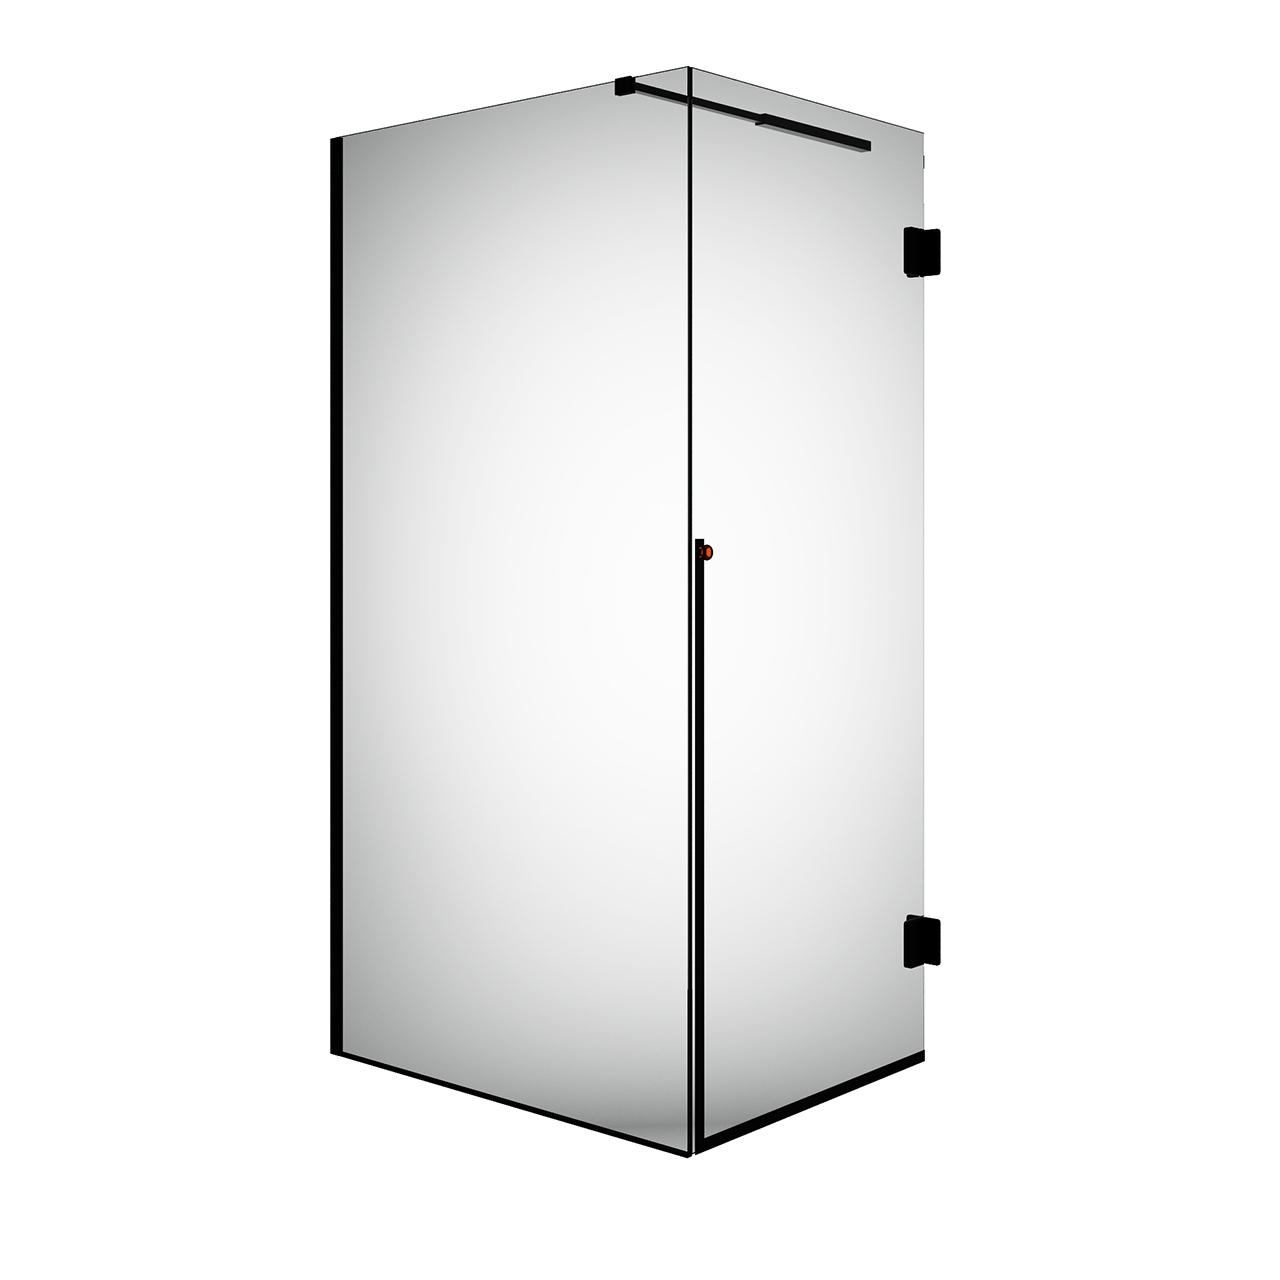 Nouveau Right Corner Shower Cabin by Ex.t